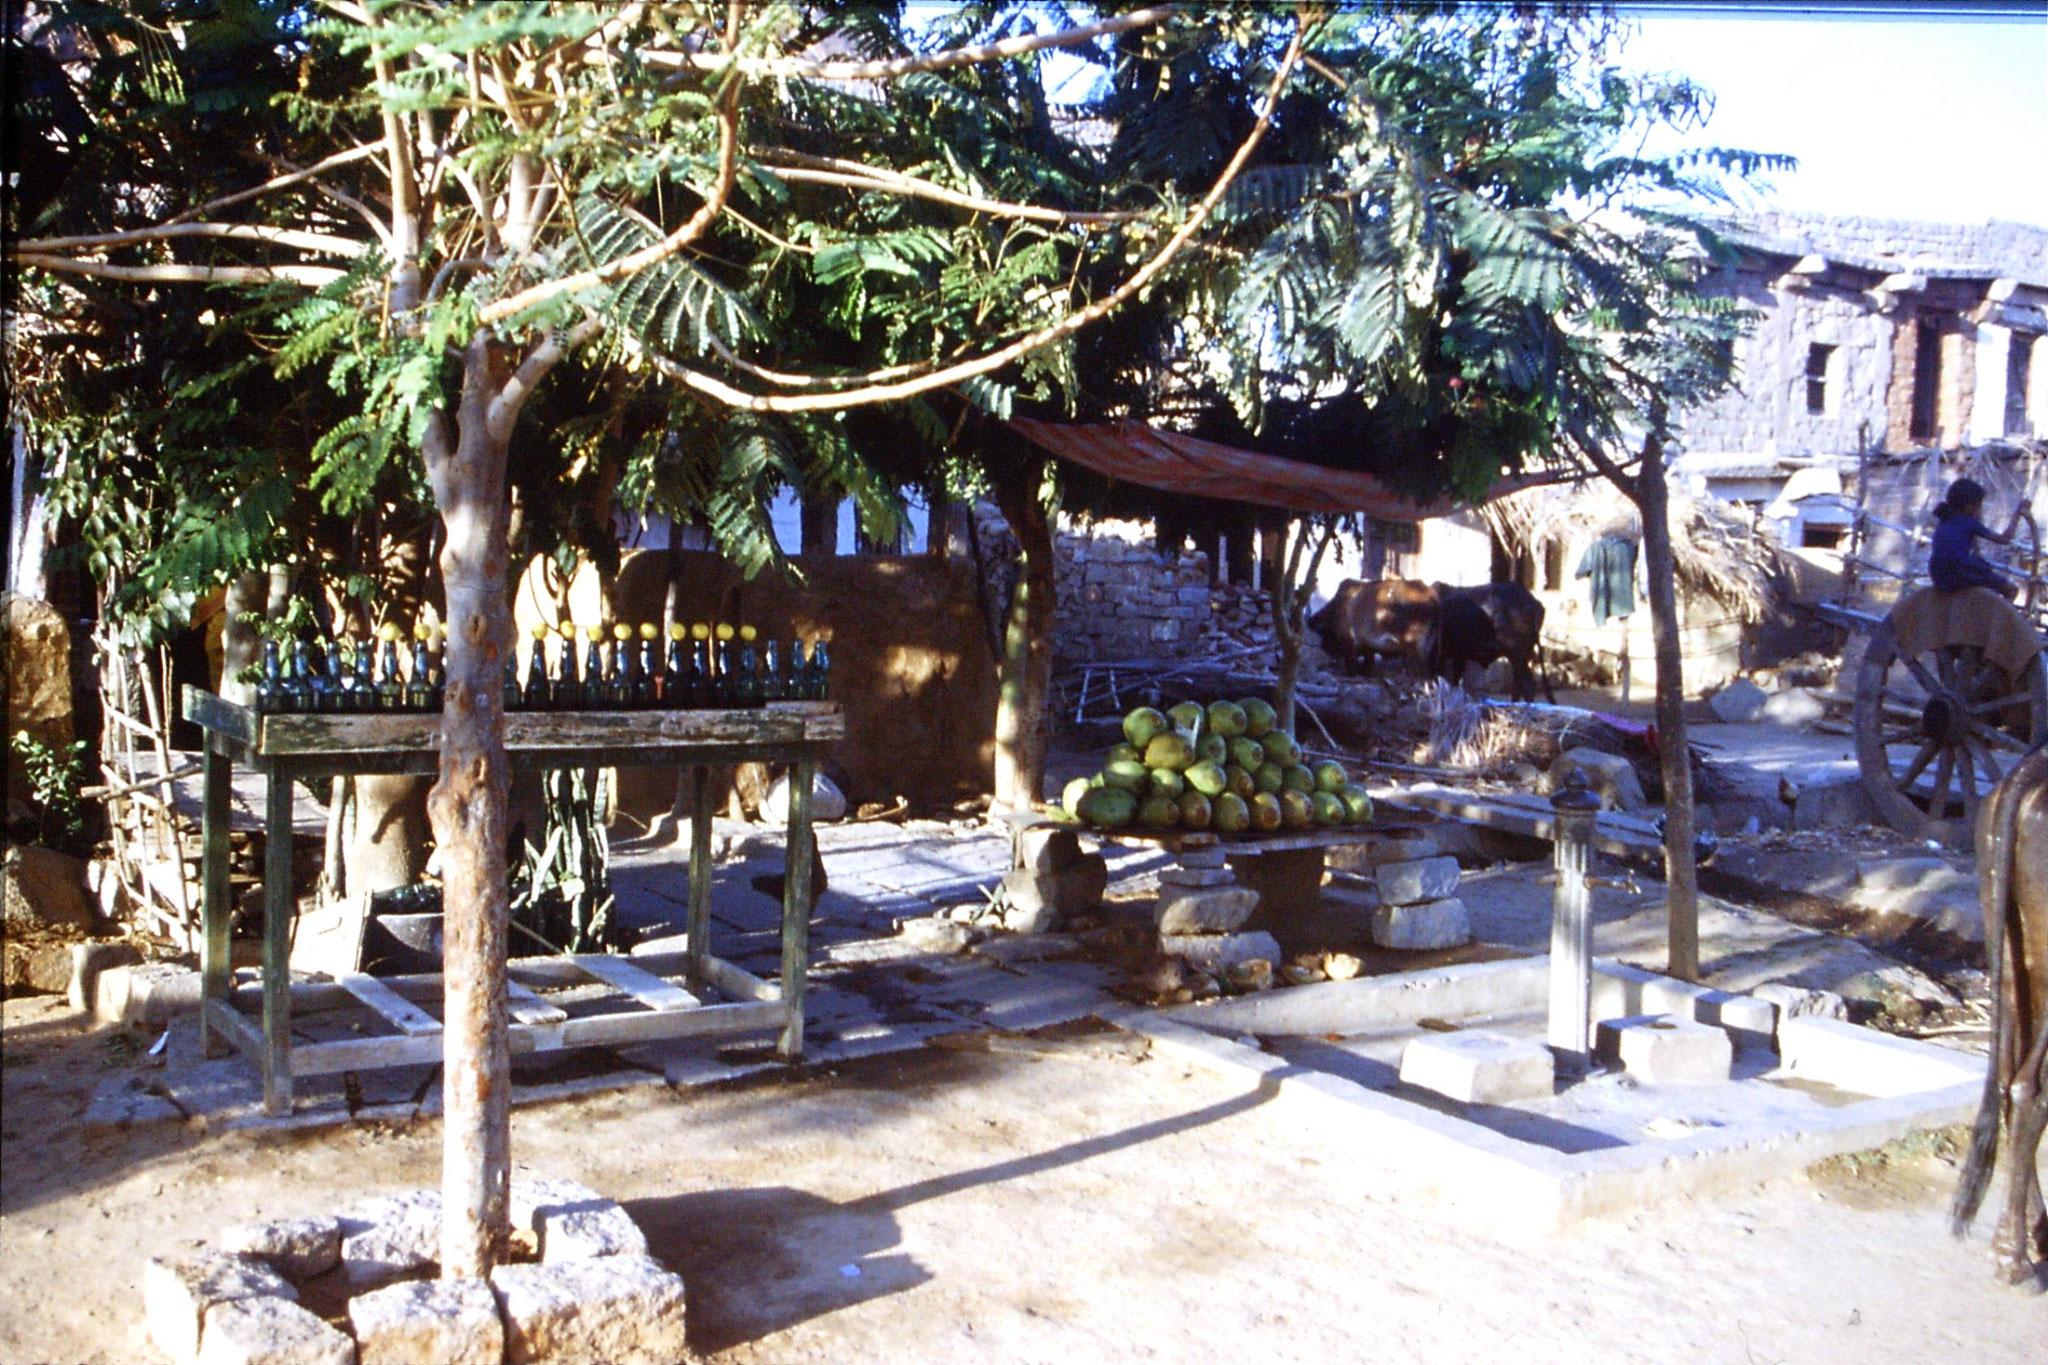 108/28: 20/3/1990 Hampi - cocnut and homemade lime soda stall